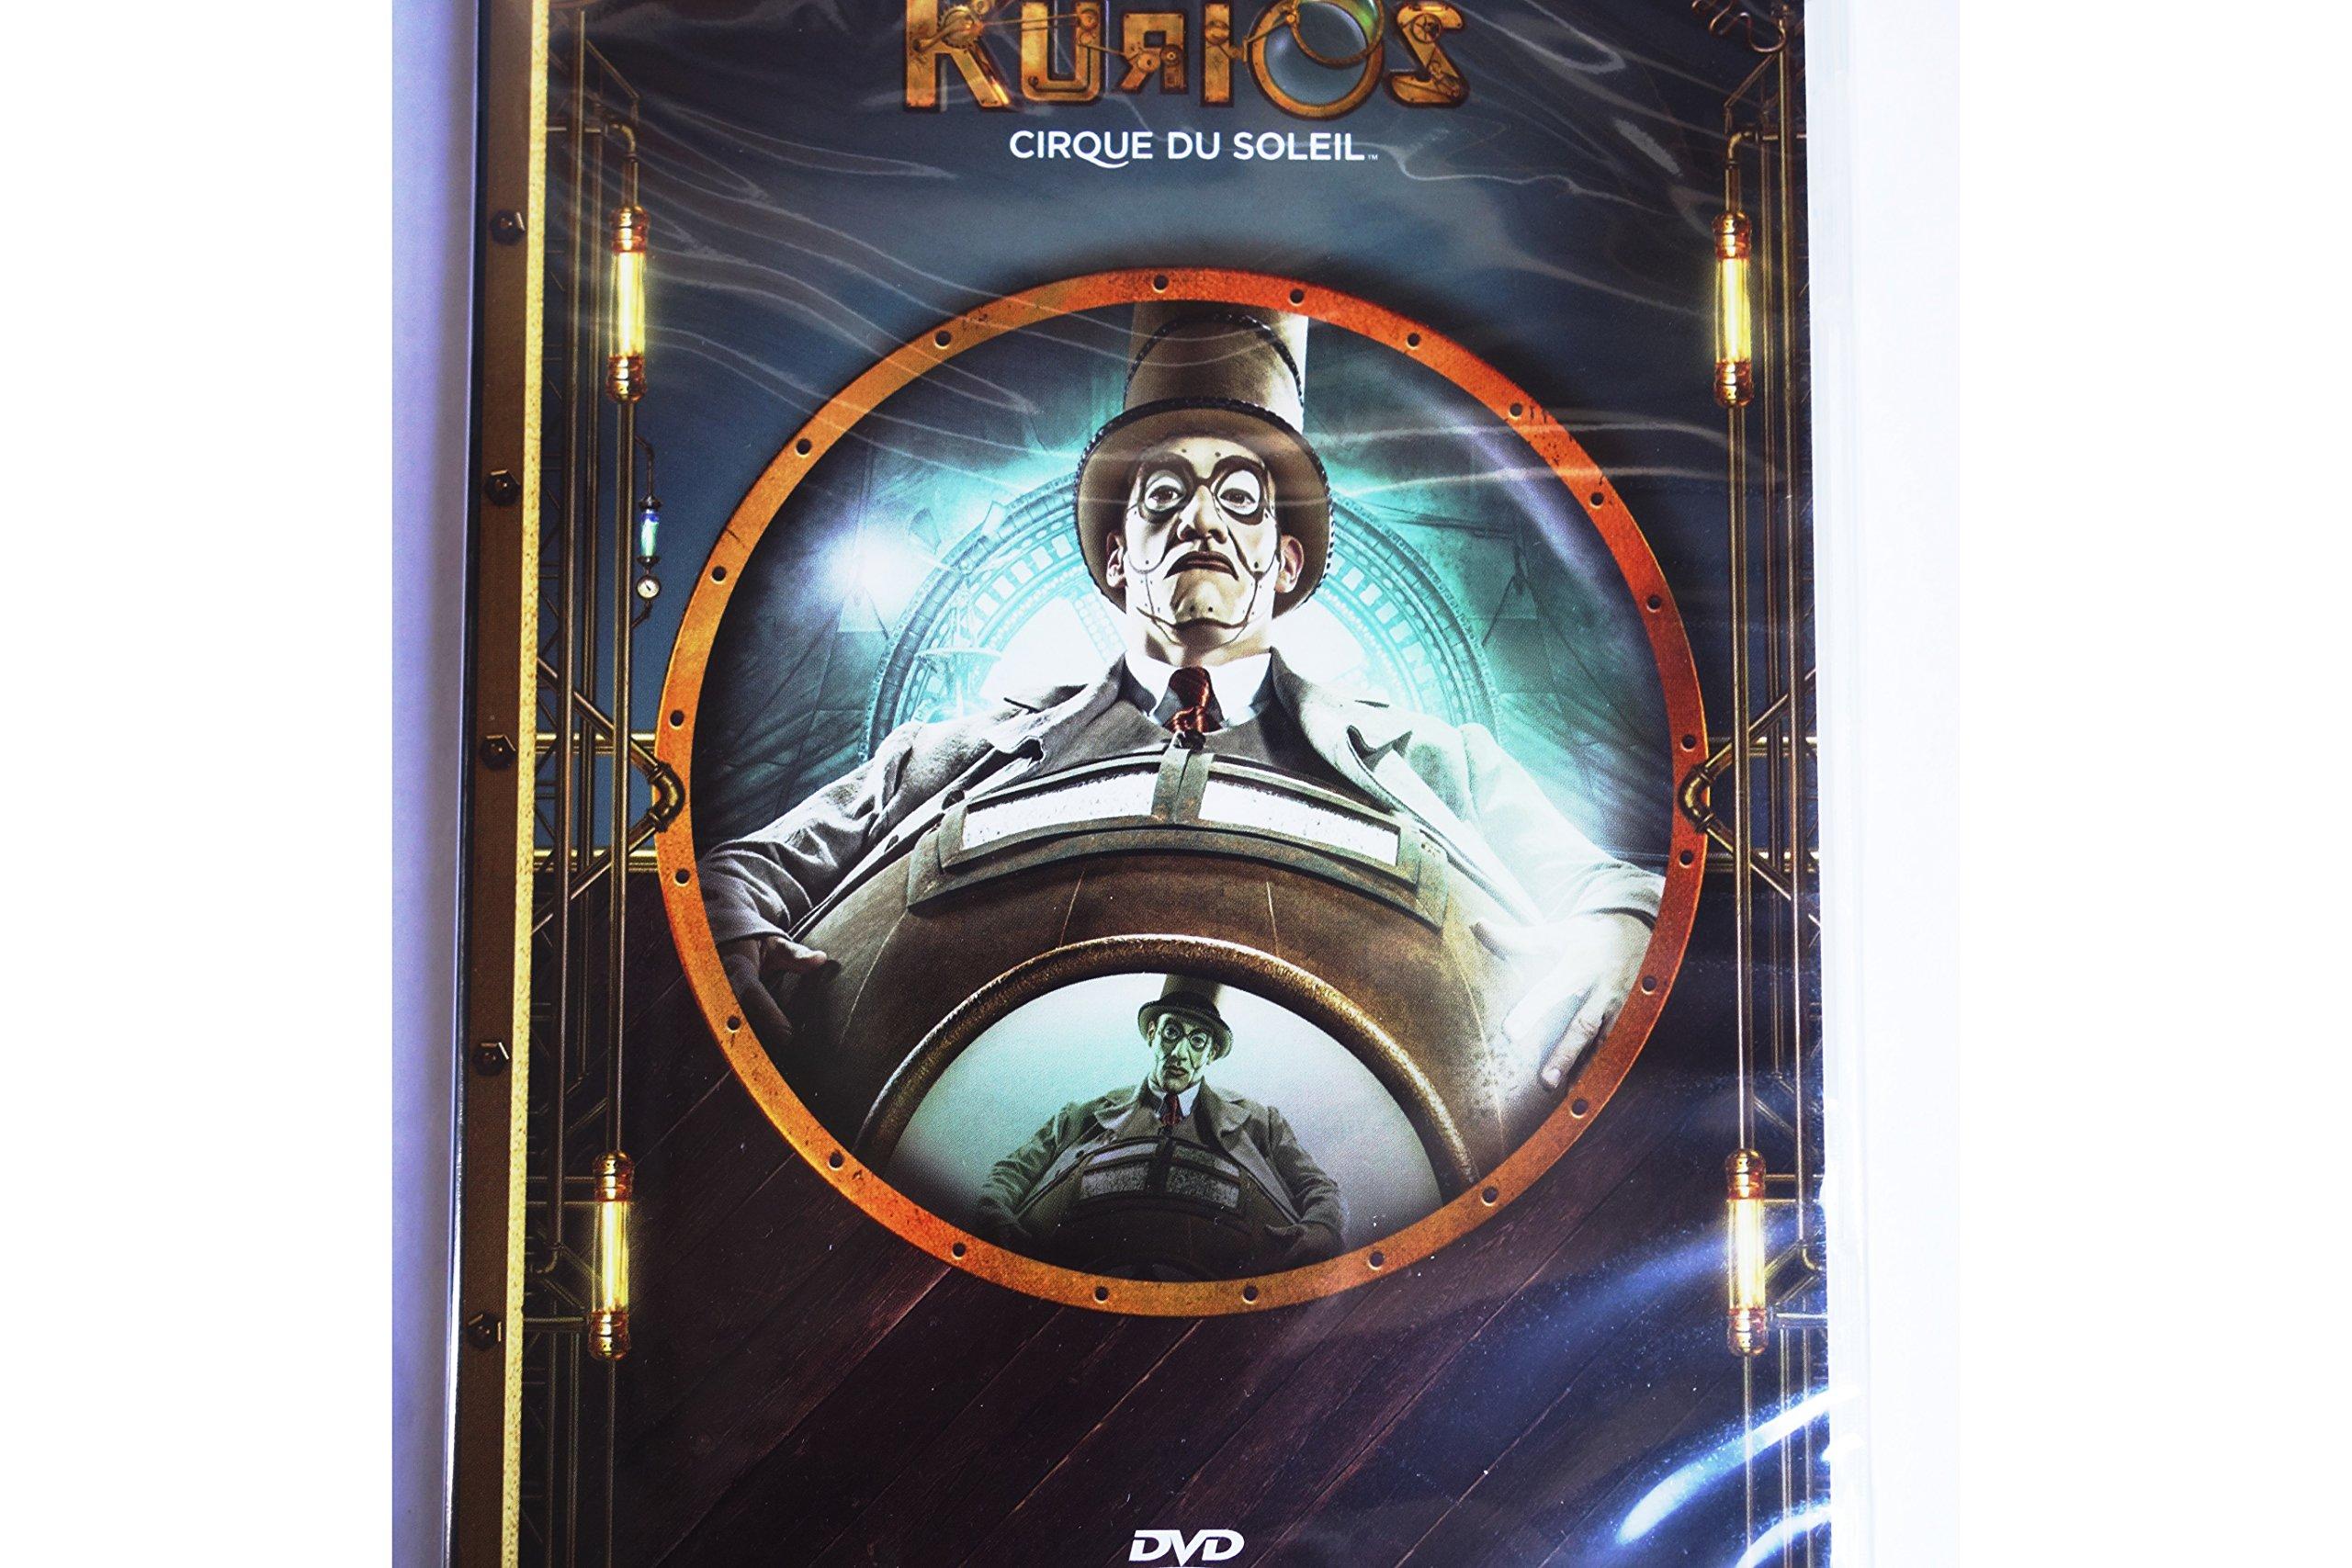 Cirque du Soleil KURIOS Circus Retro futurism retro future Daihatsu 2017 Michel Laprise DVD by